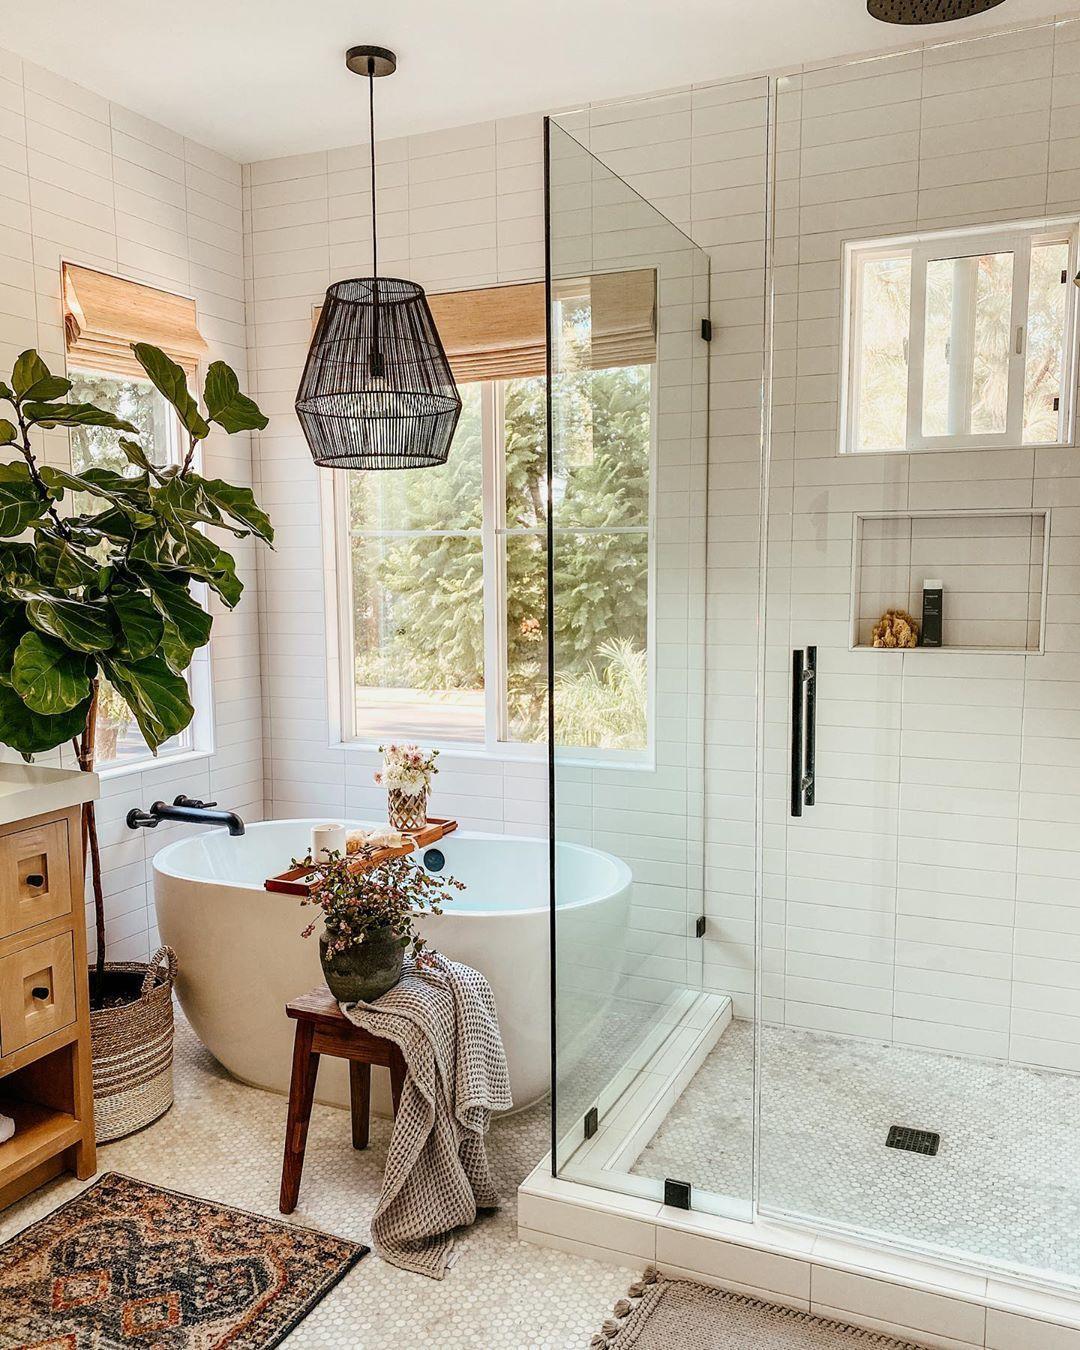 California Casual Bathroom In 2020 Bathroom Interior Design Bathroom Interior Bathroom Inspiration